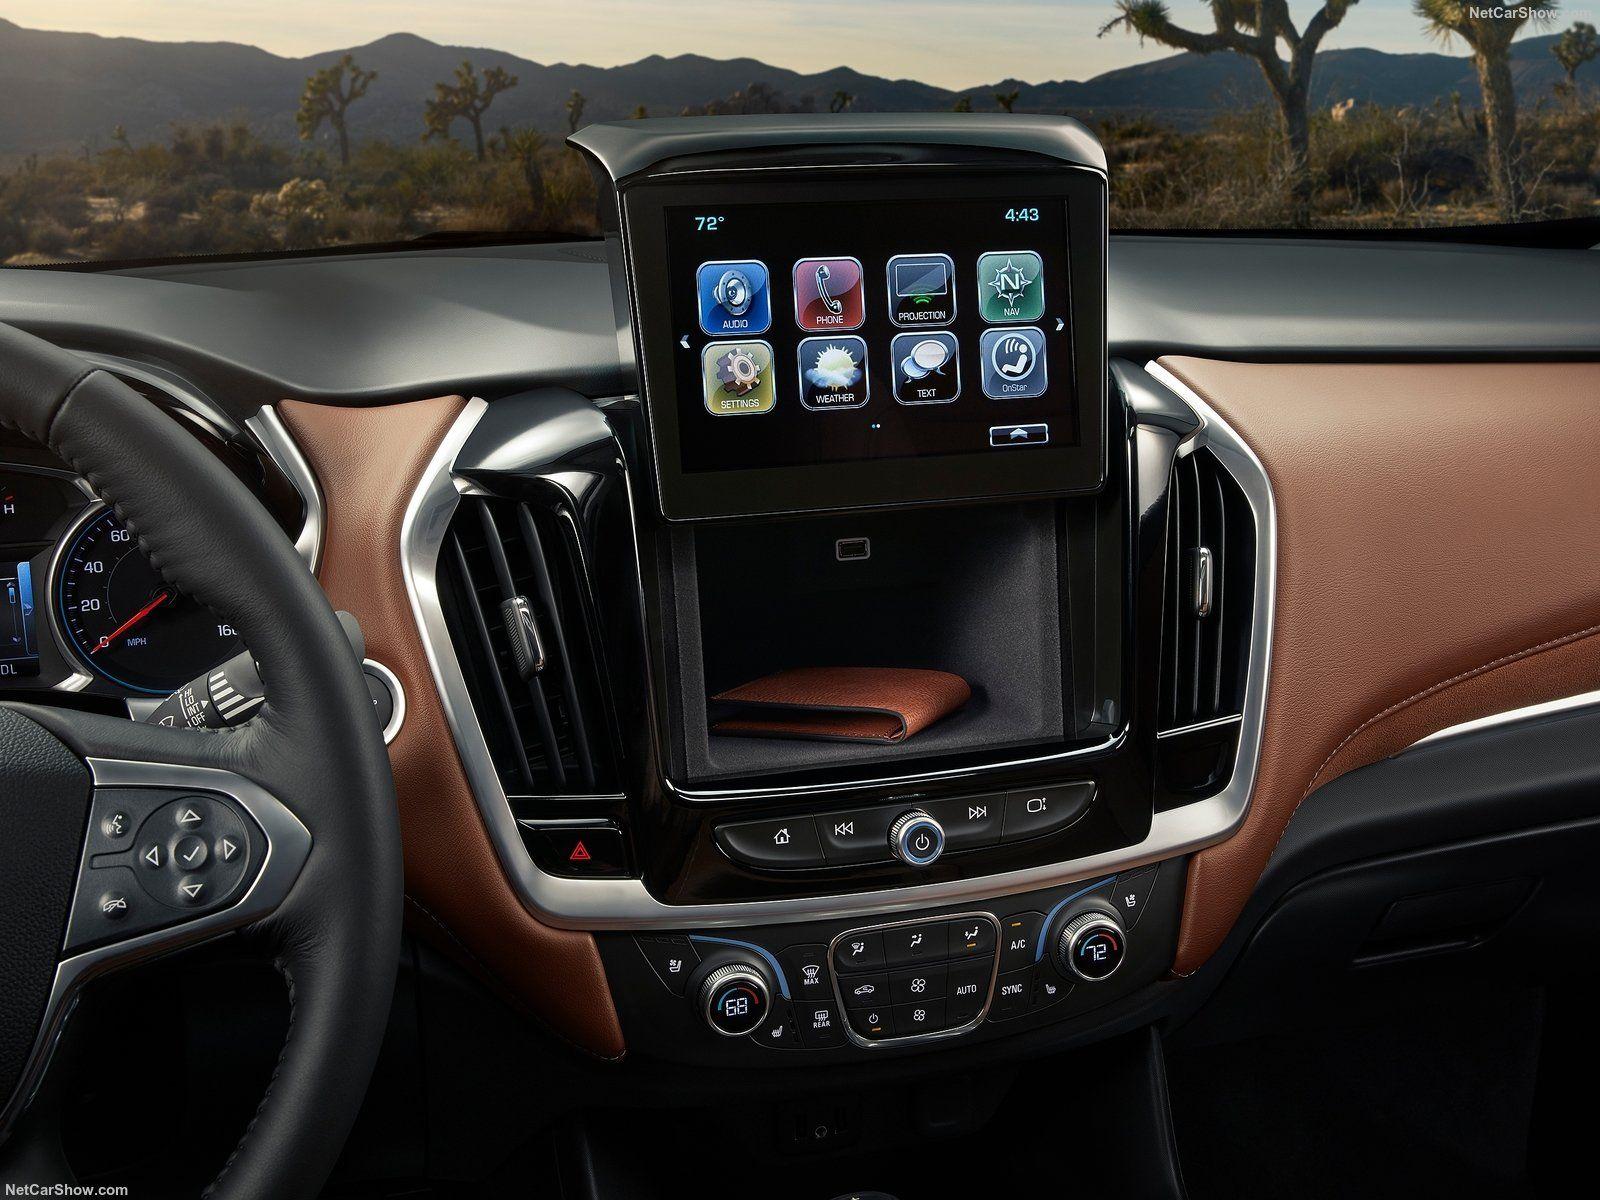 Chevrolet traverse 2017 interior detail https www netcarshow com chevrolet